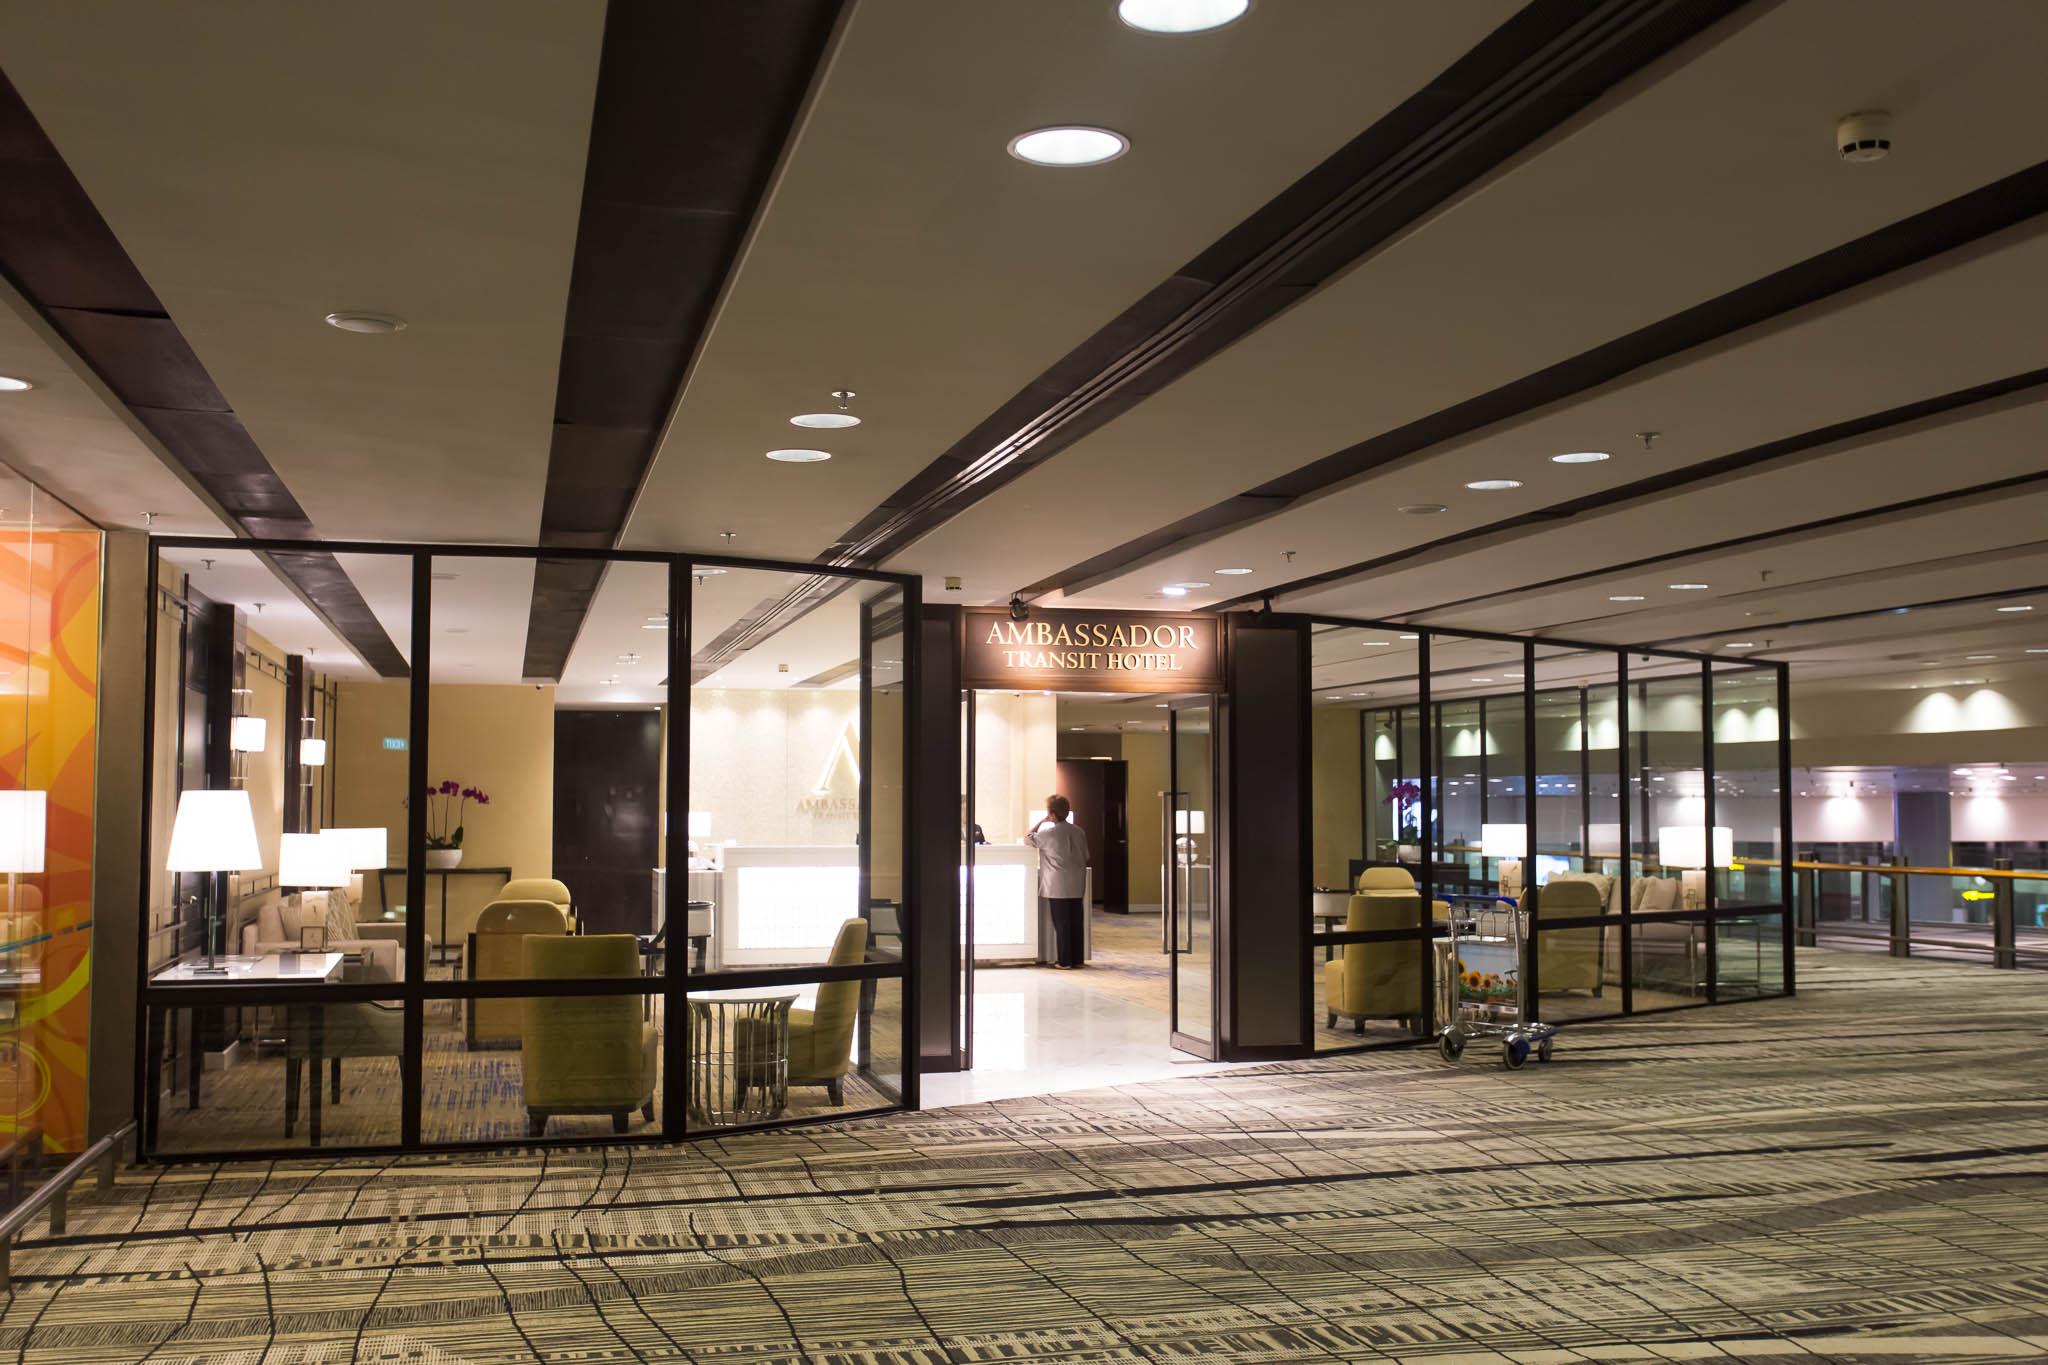 Ambassador Hotel Entry